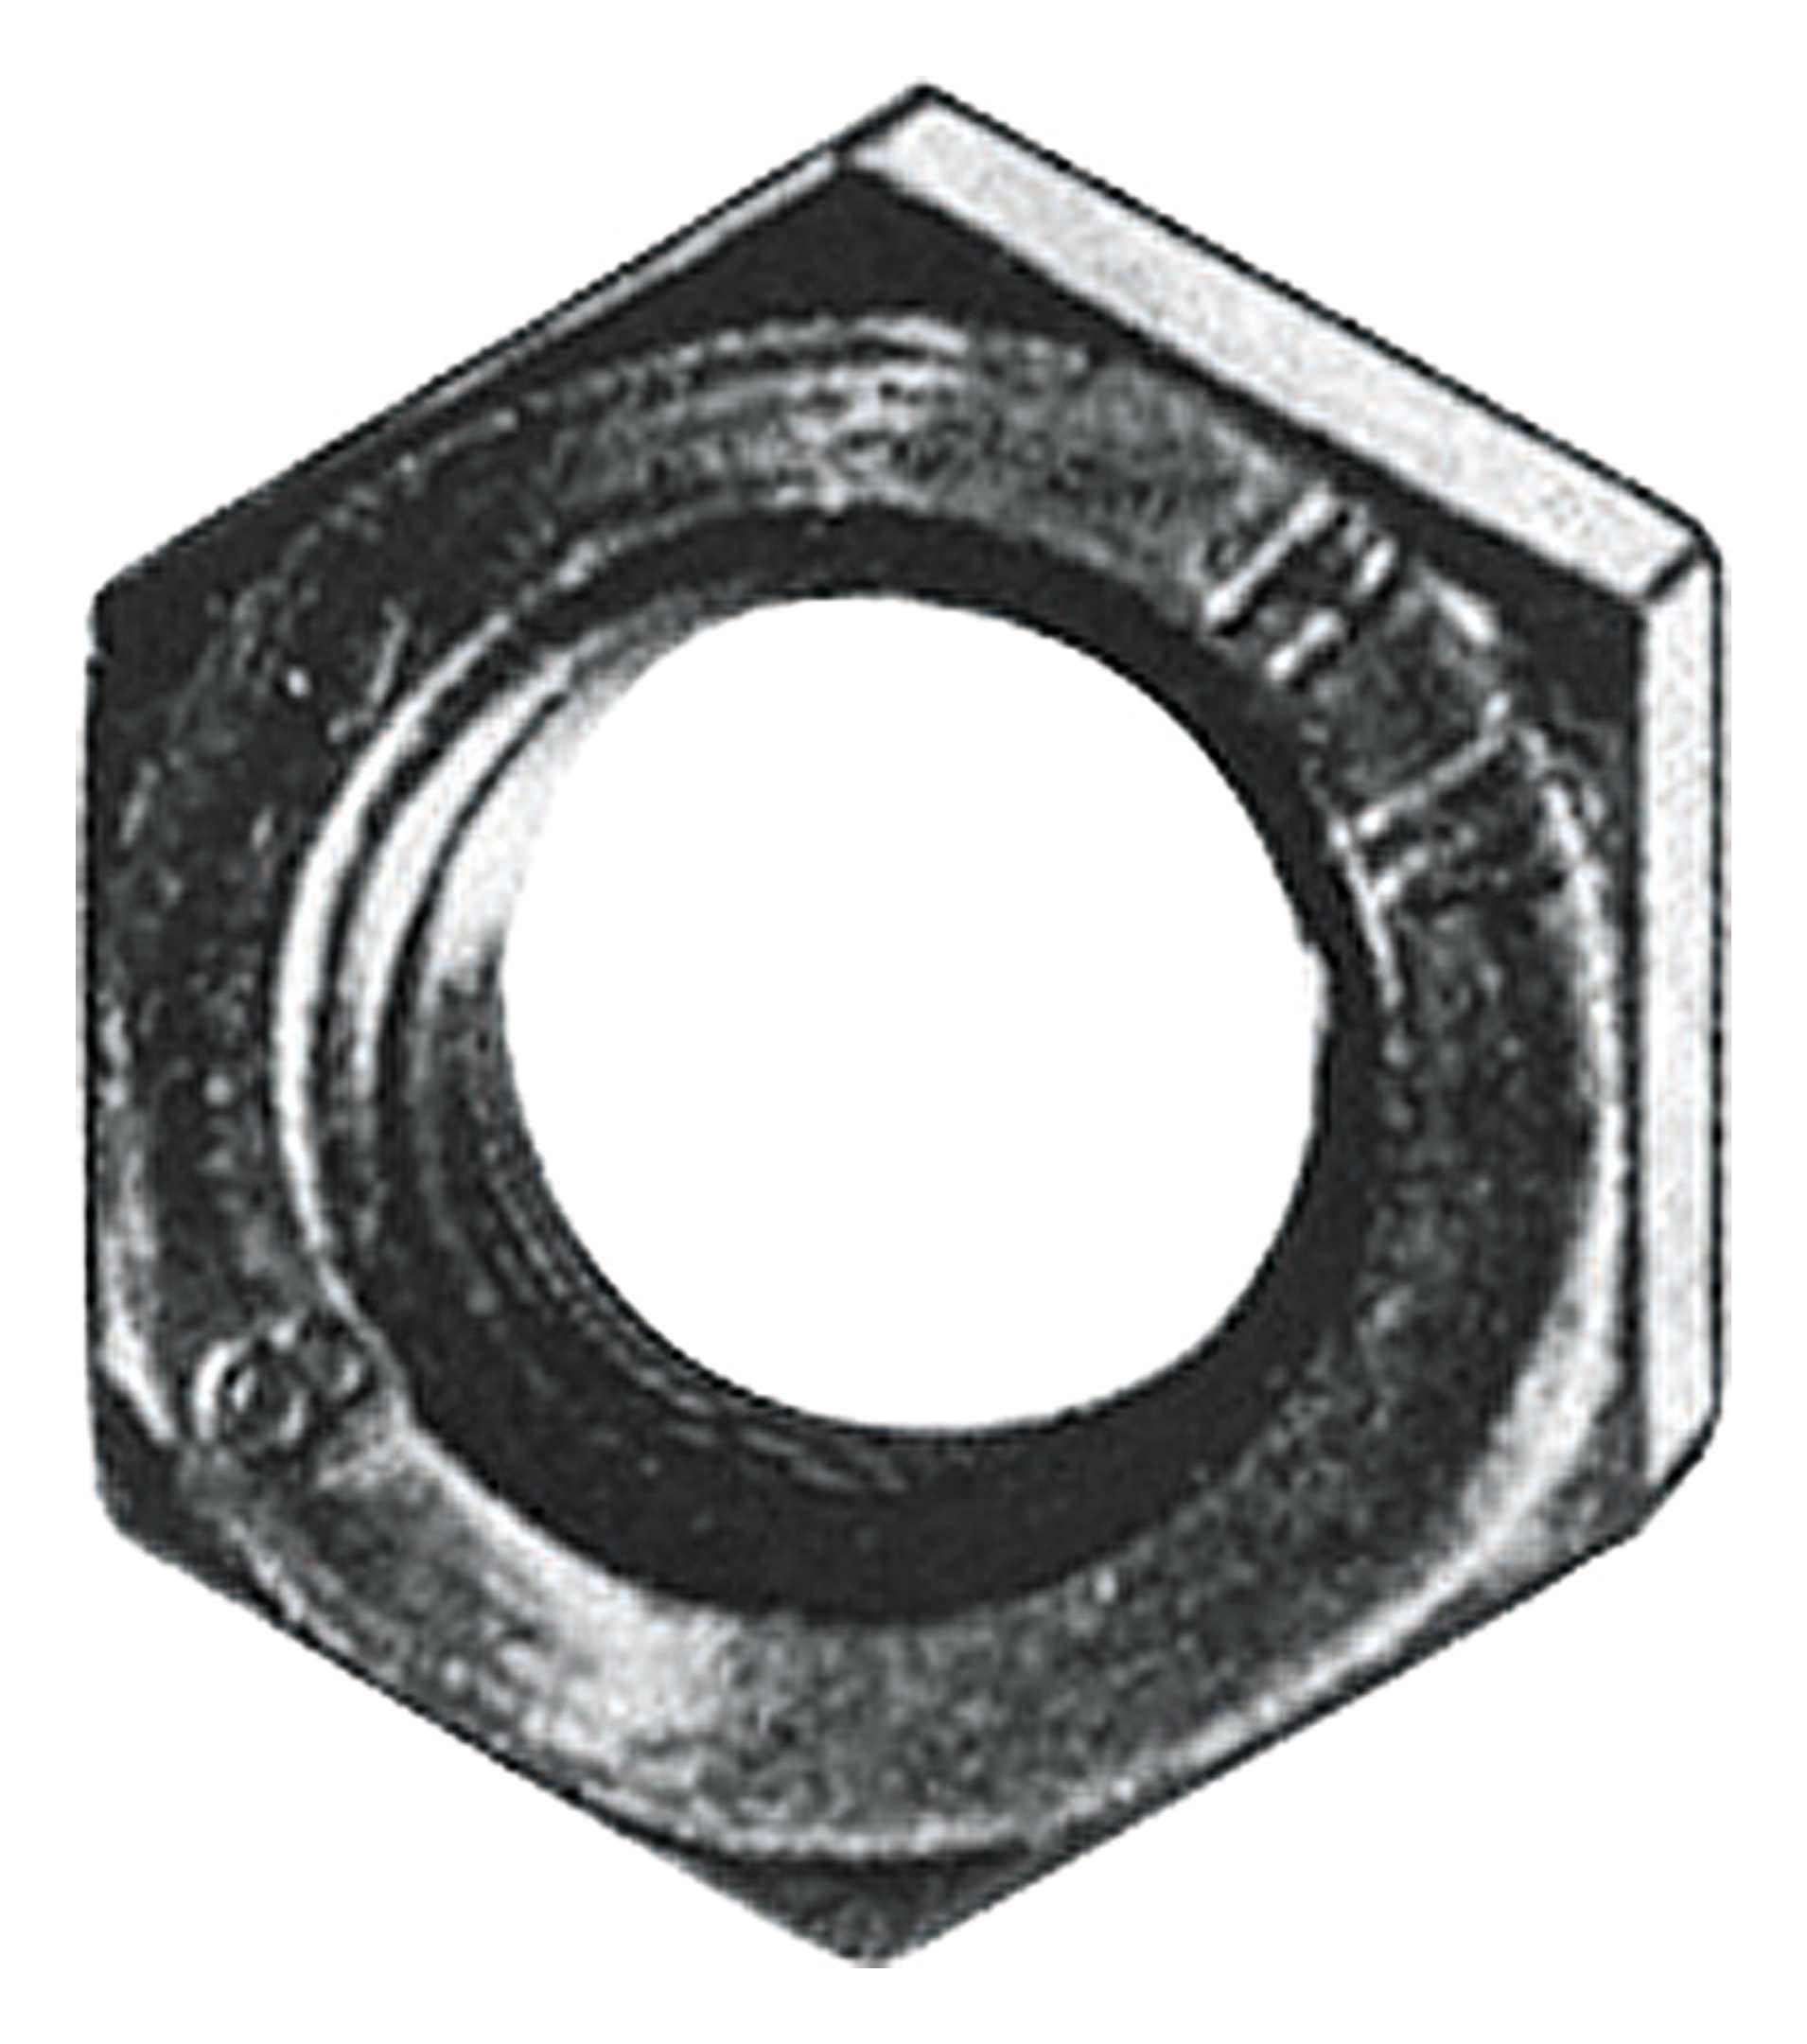 Sechskantmuttern Edelstahl A2 V2A DIN 934 // ISO 4032 VPE: 10 St/ück Sechskant-Mutter D2D Gr/ö/ße: M2